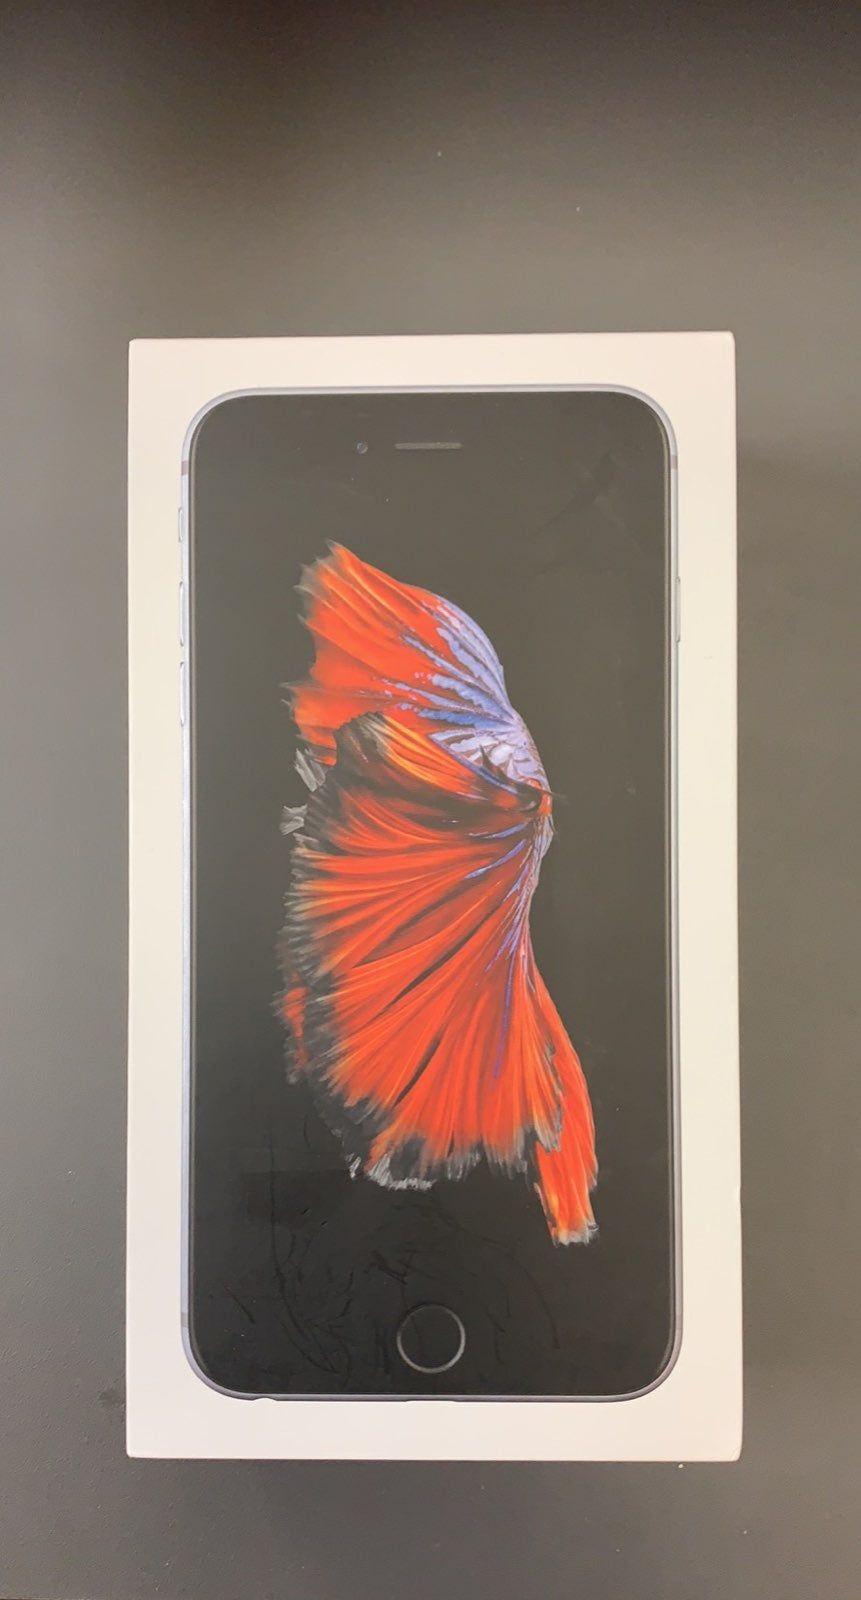 Boost mobile iphone 6s plus 32gb space gray original box